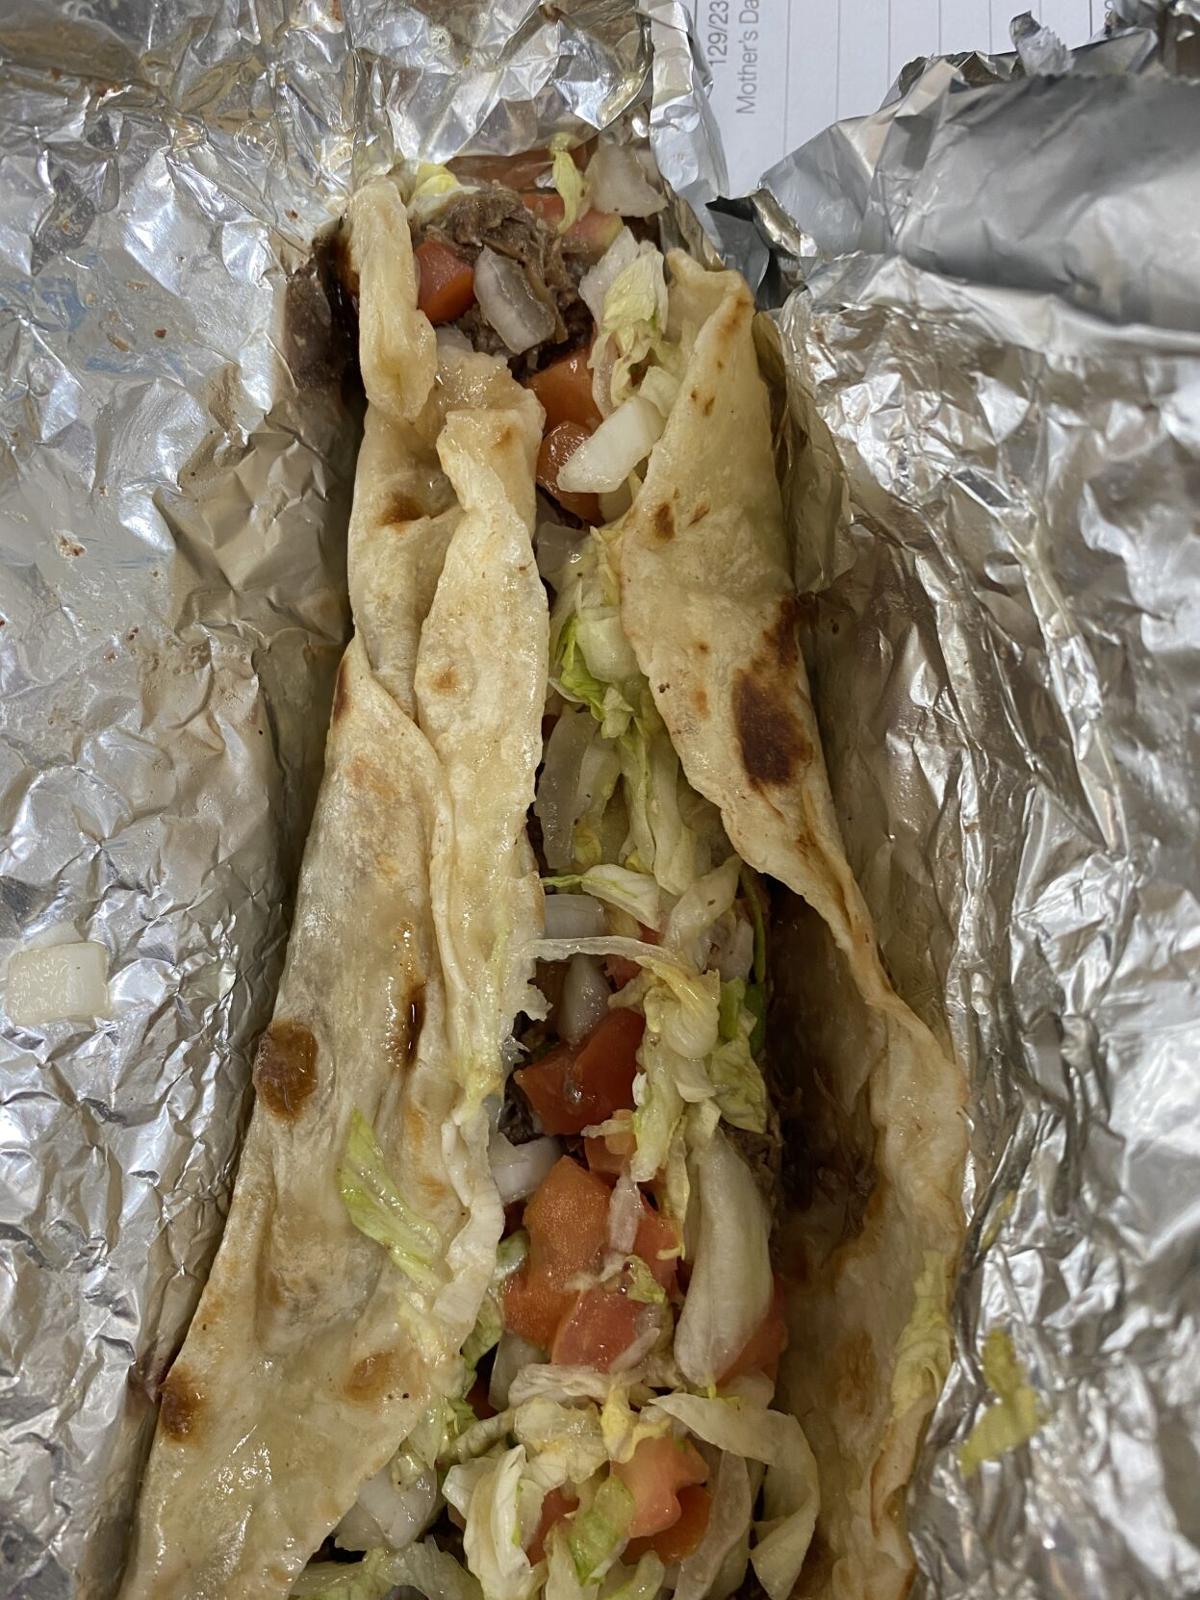 Charlie's Tacos Carne Guisada